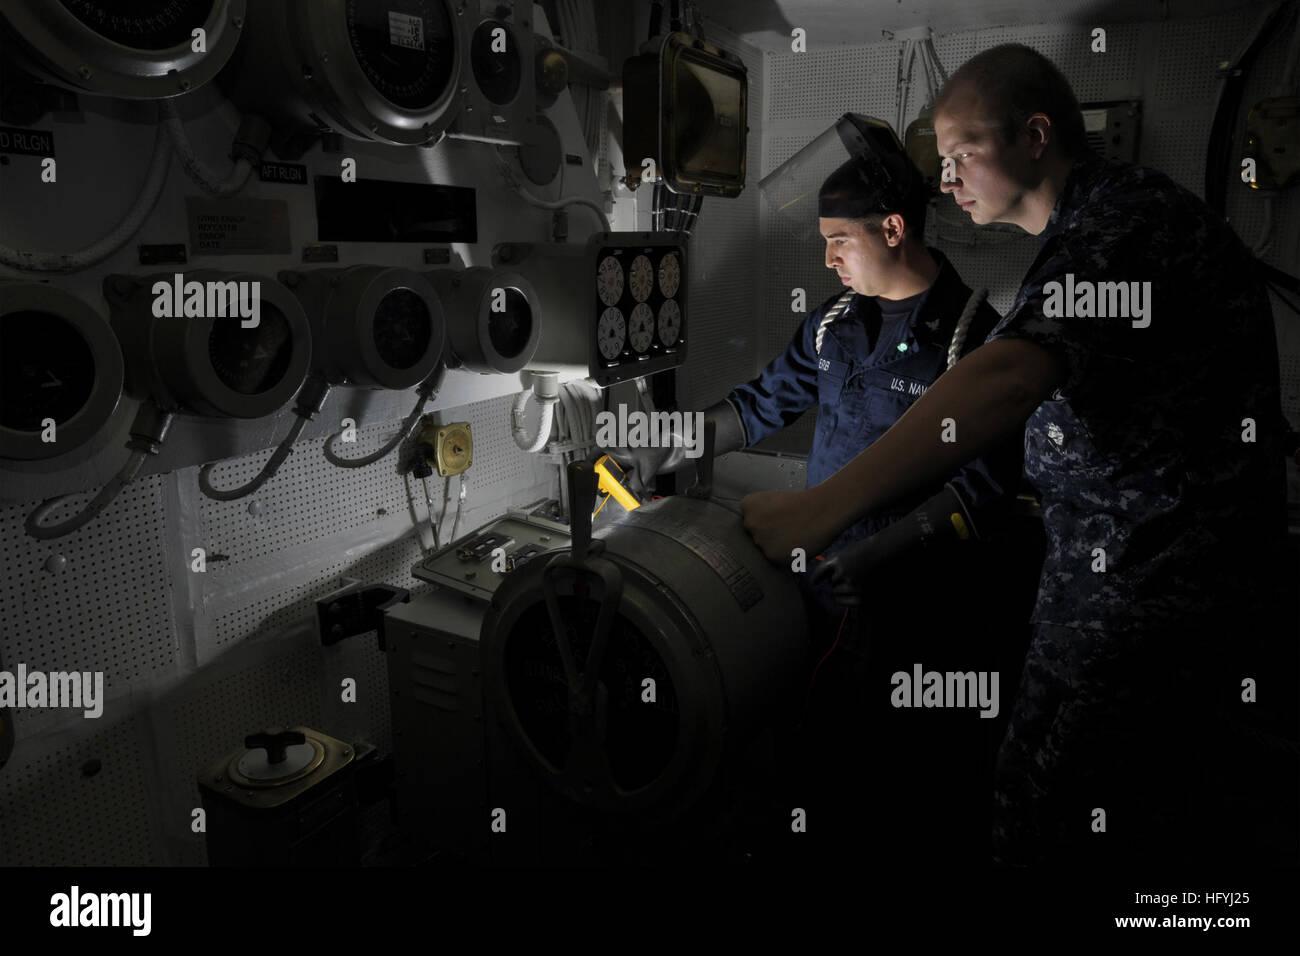 101215 N 7422B 060 PACIFIC OCEAN (Dec. 15, 2010) Interior Communications  Specialist 3rd Class Adam Erb And Interior Communications Specialist 2nd  Class Alan ...